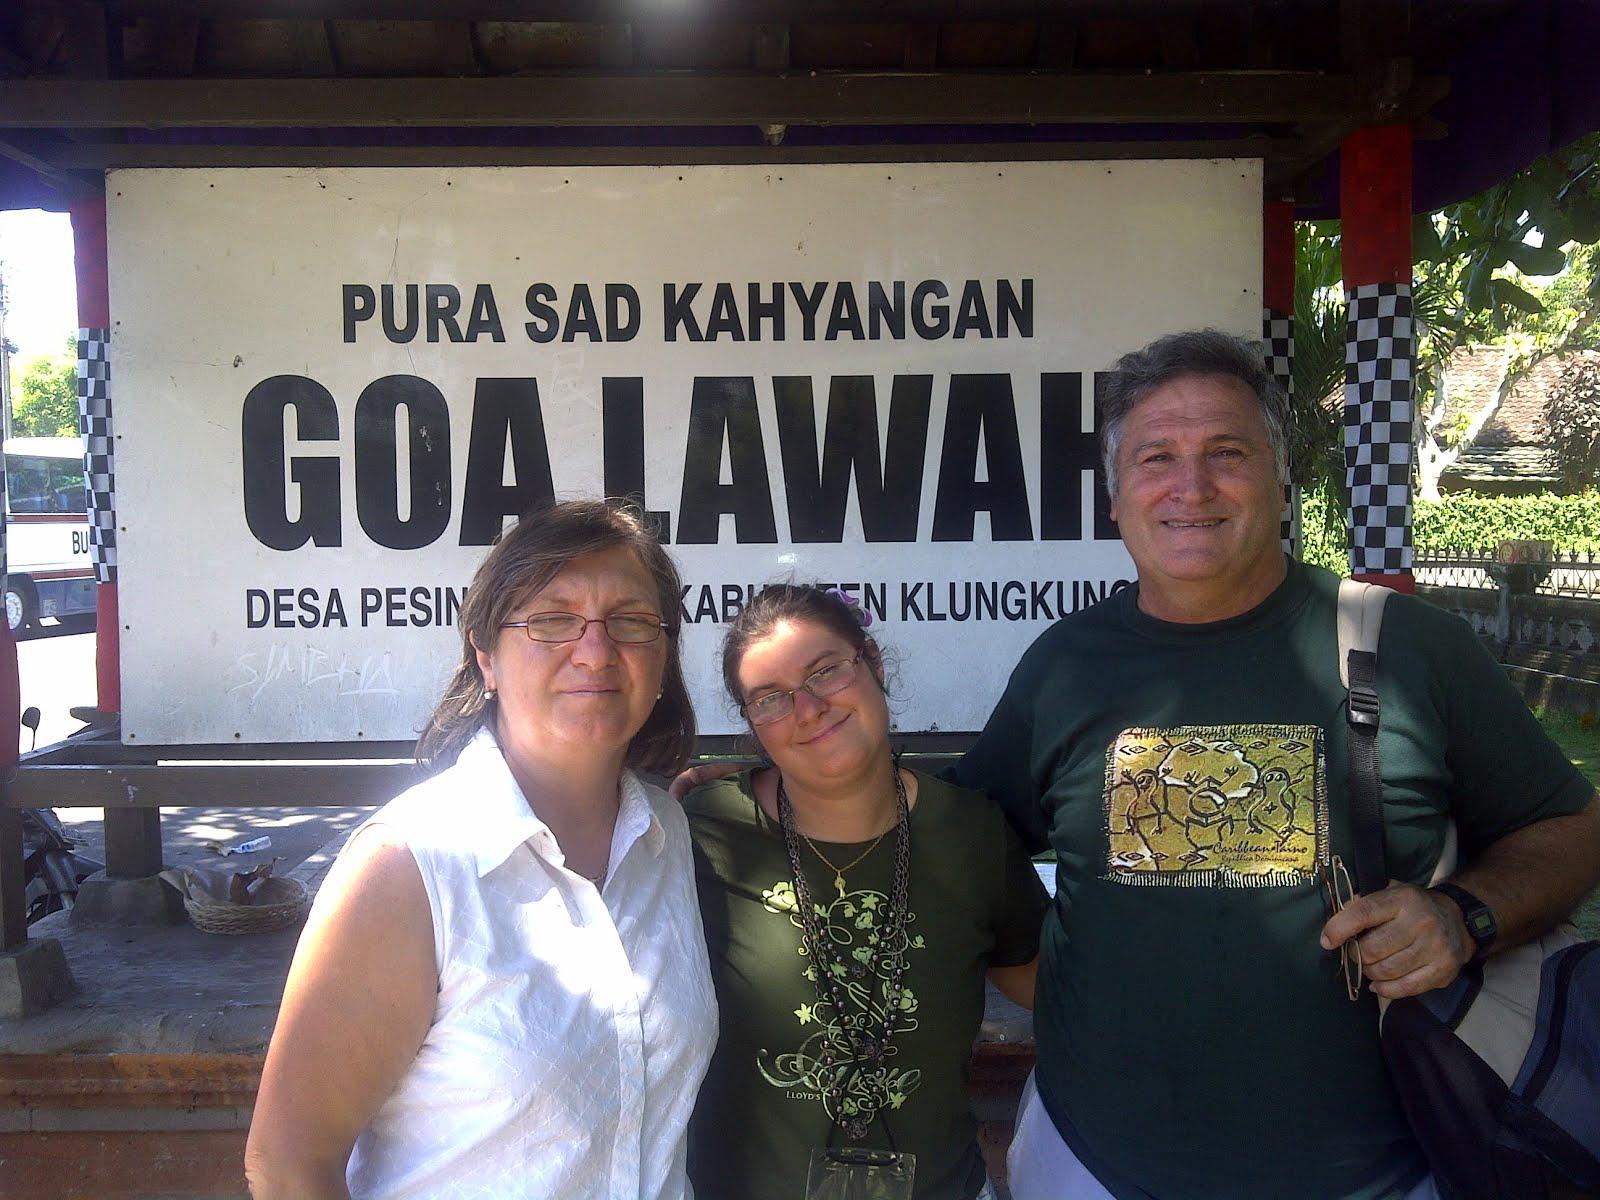 Templo Goa Lawah, Bali, vuelta al mundo, round the world, La vuelta al mundo de Asun y Ricardo